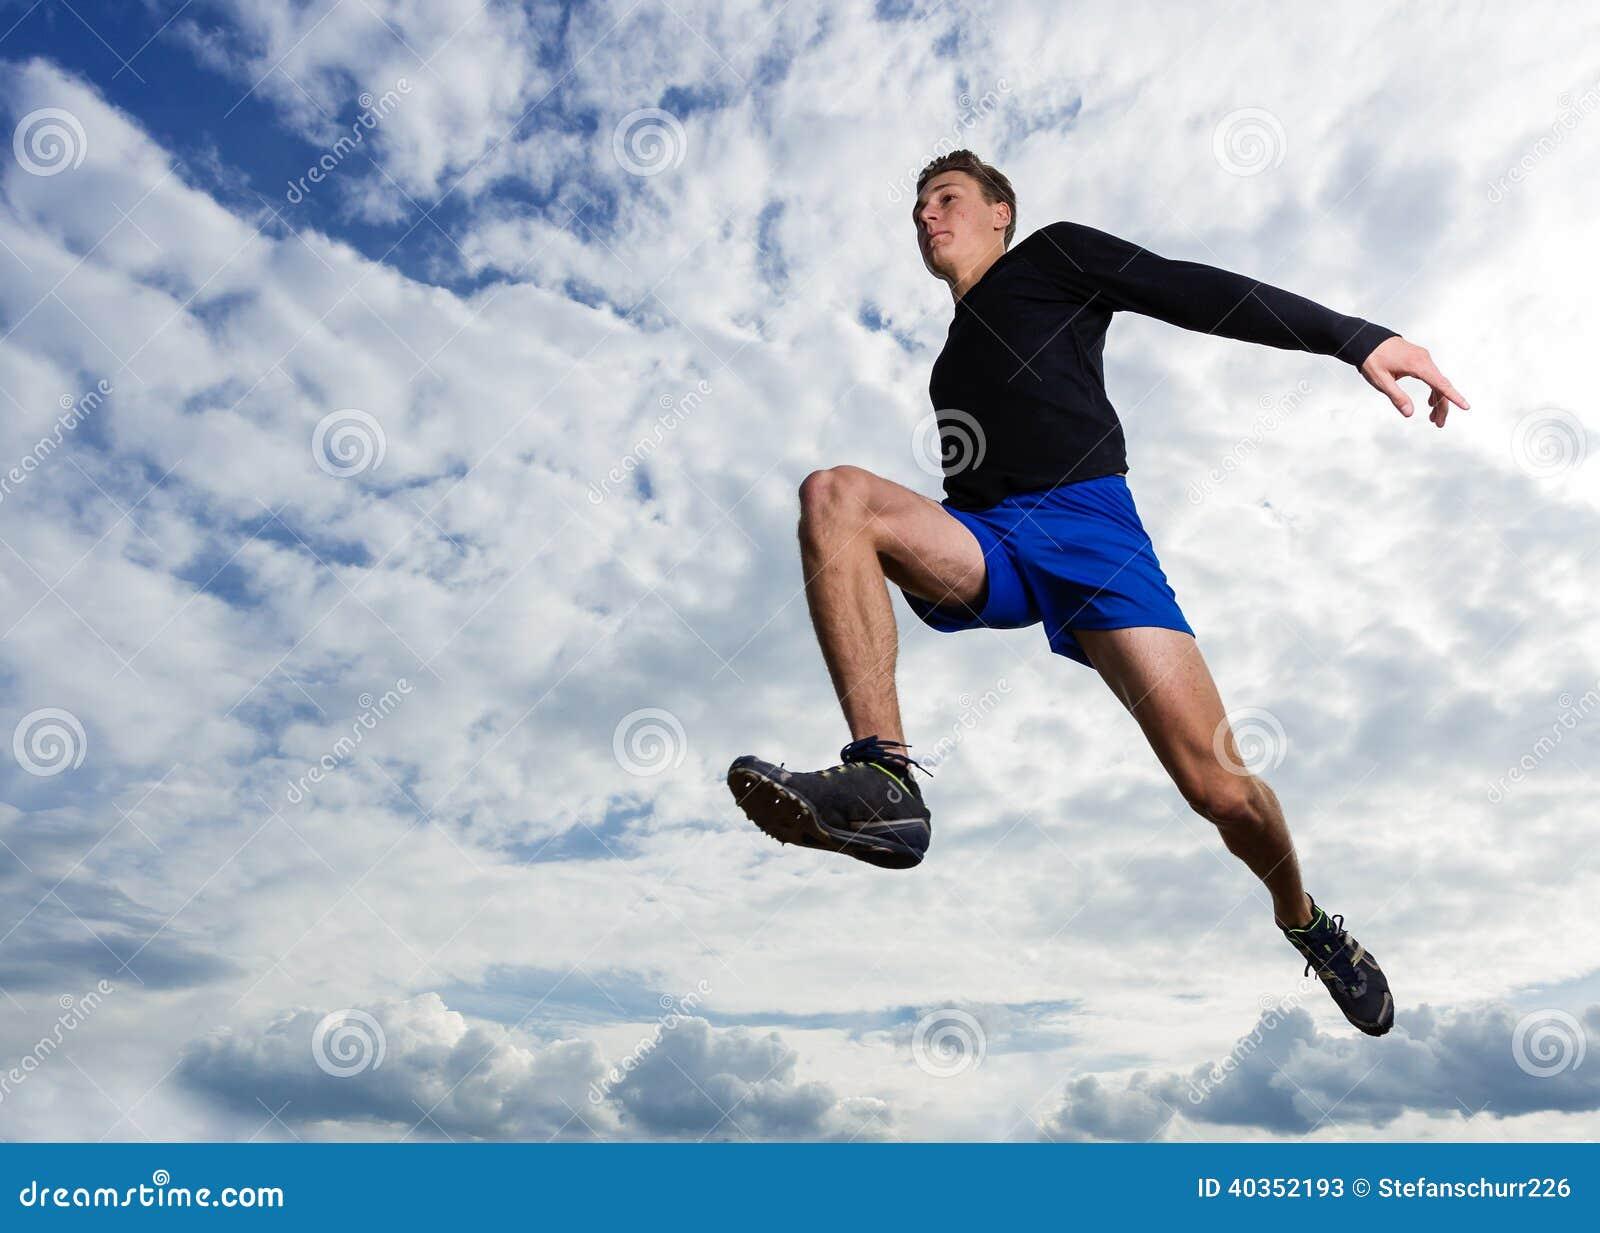 Long jump track